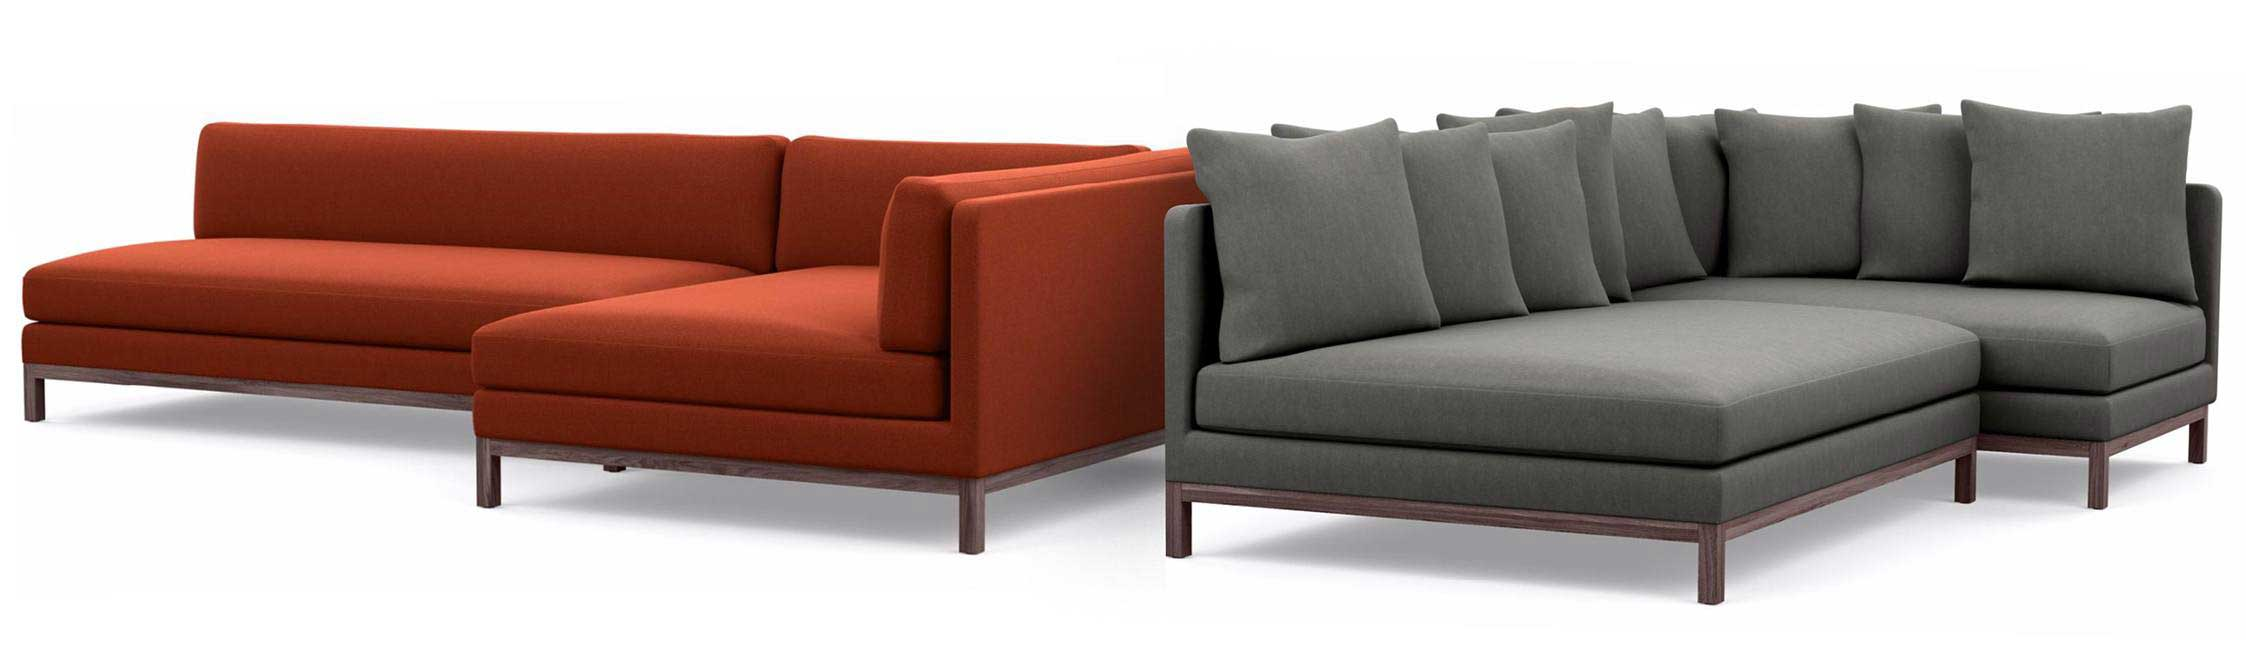 Interior Define: Jasper Sofa